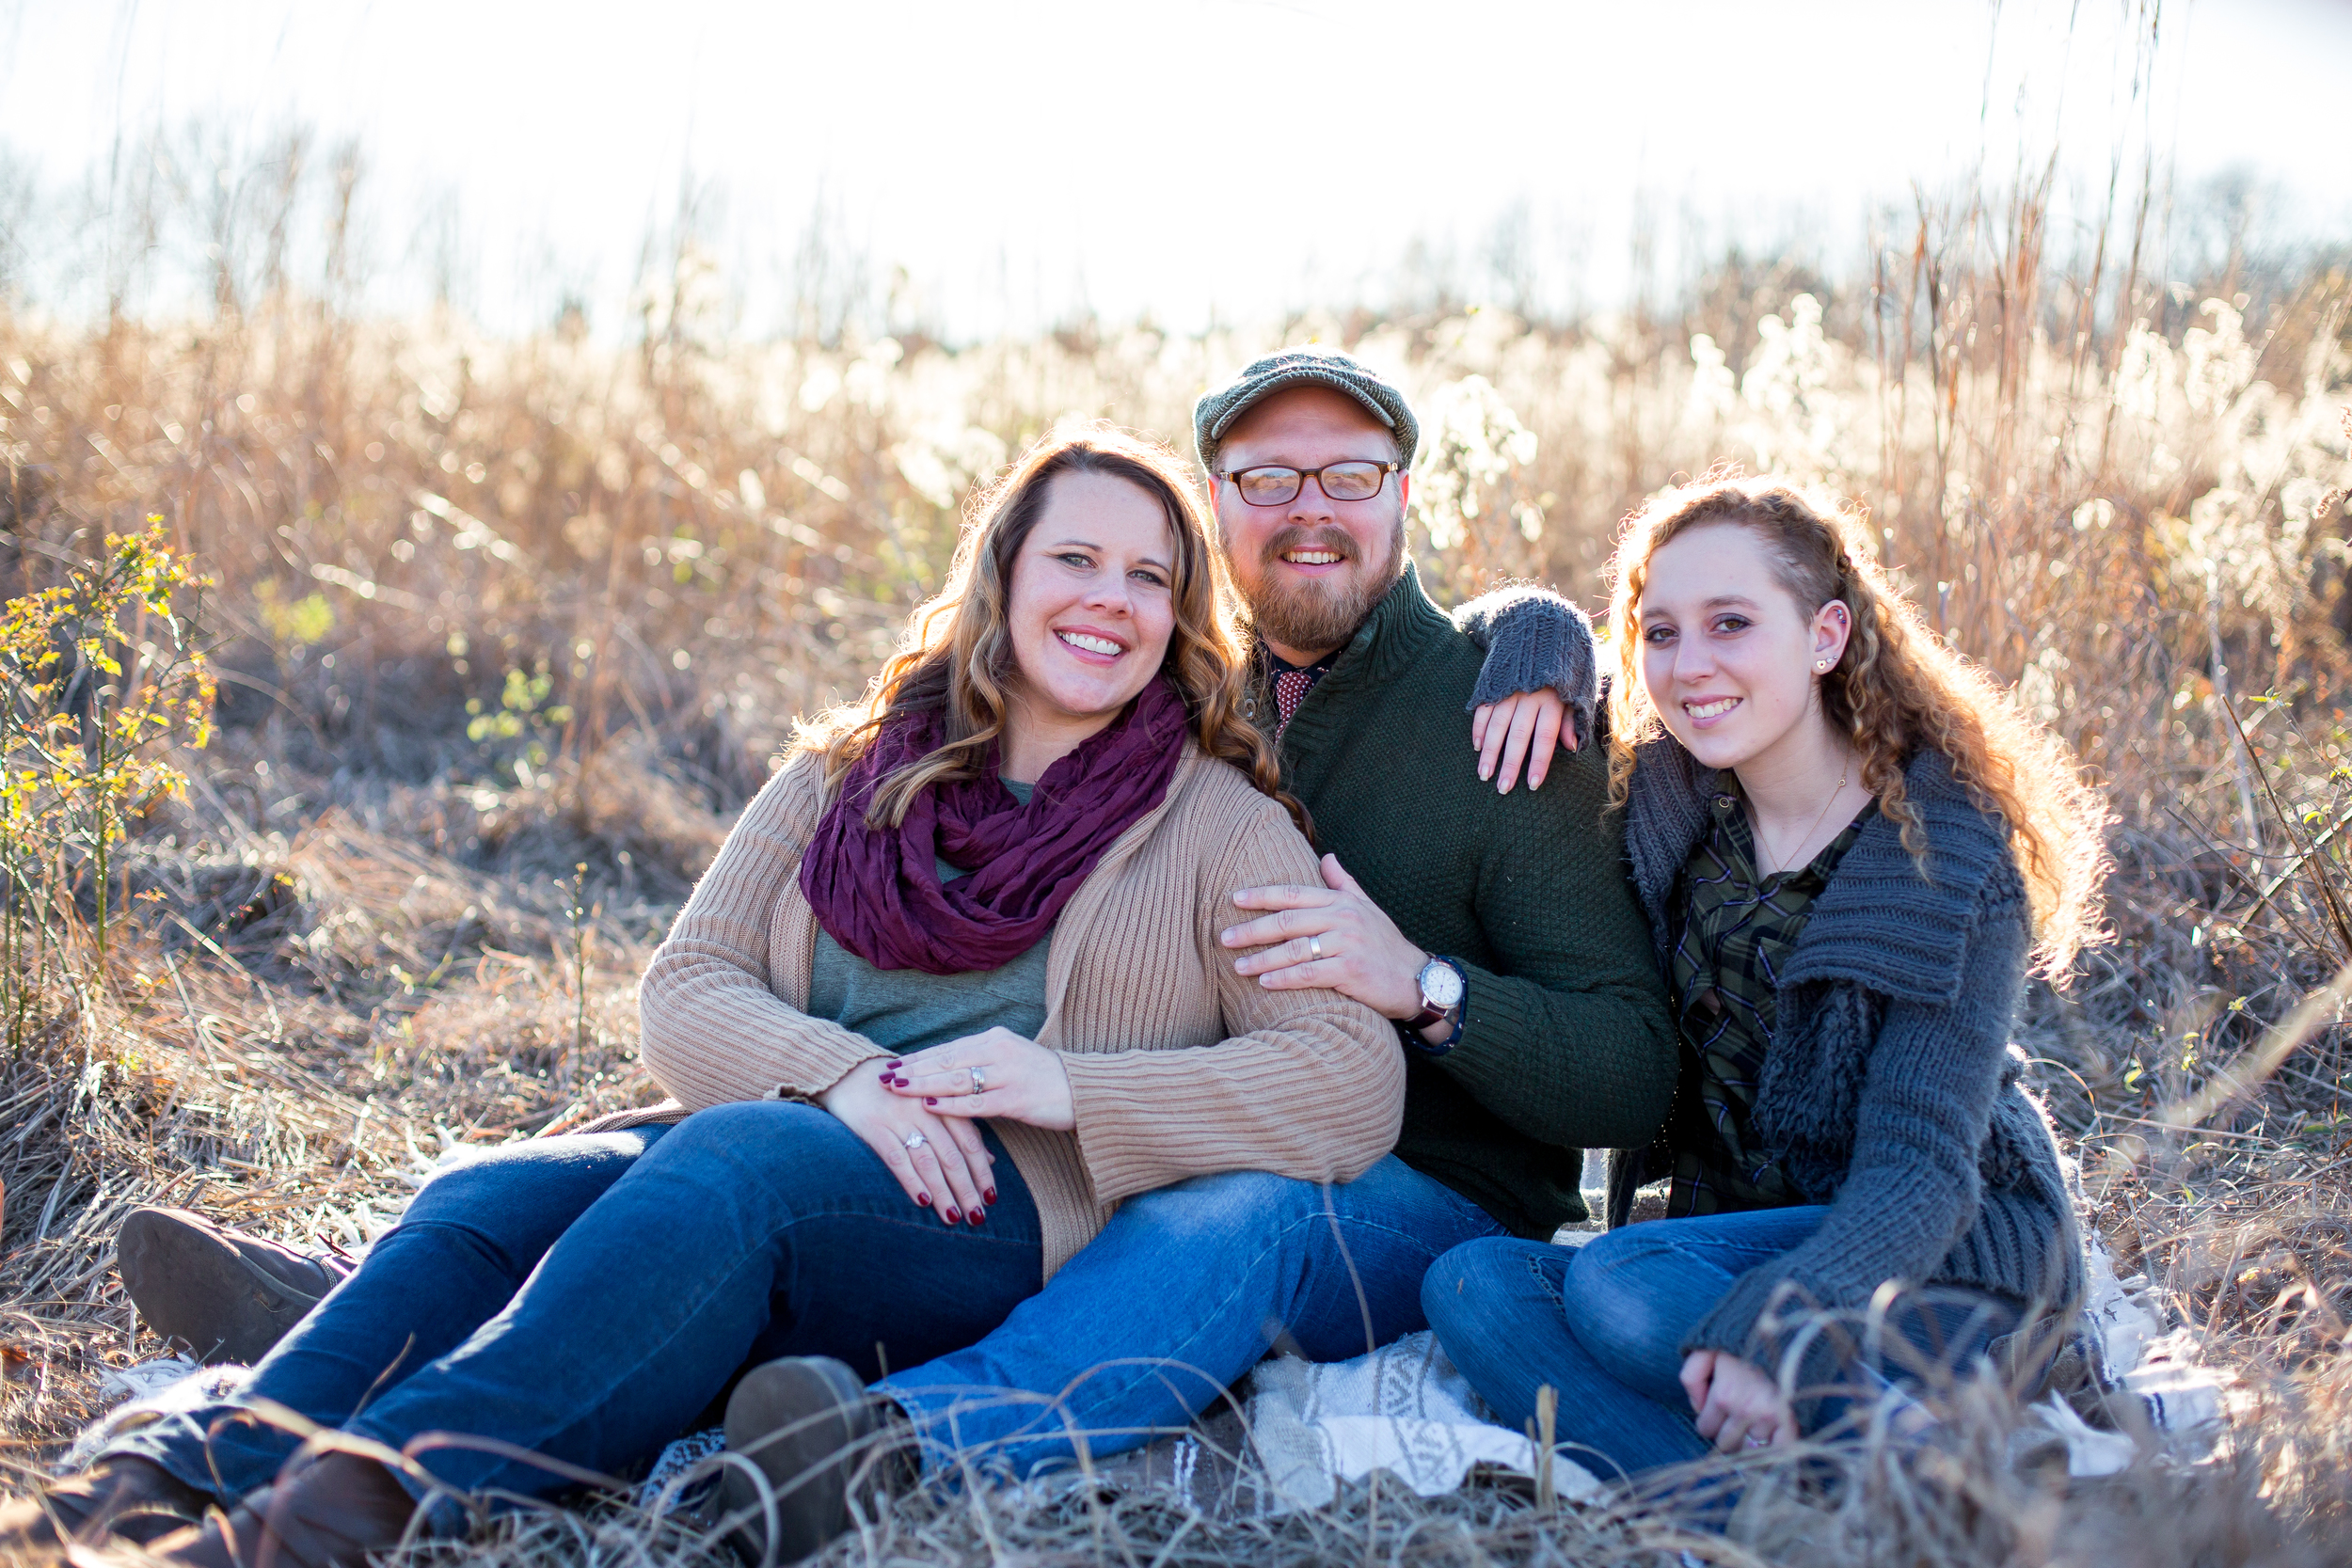 Demeter Family Portraits - Corrie Mick Photography-19.jpg